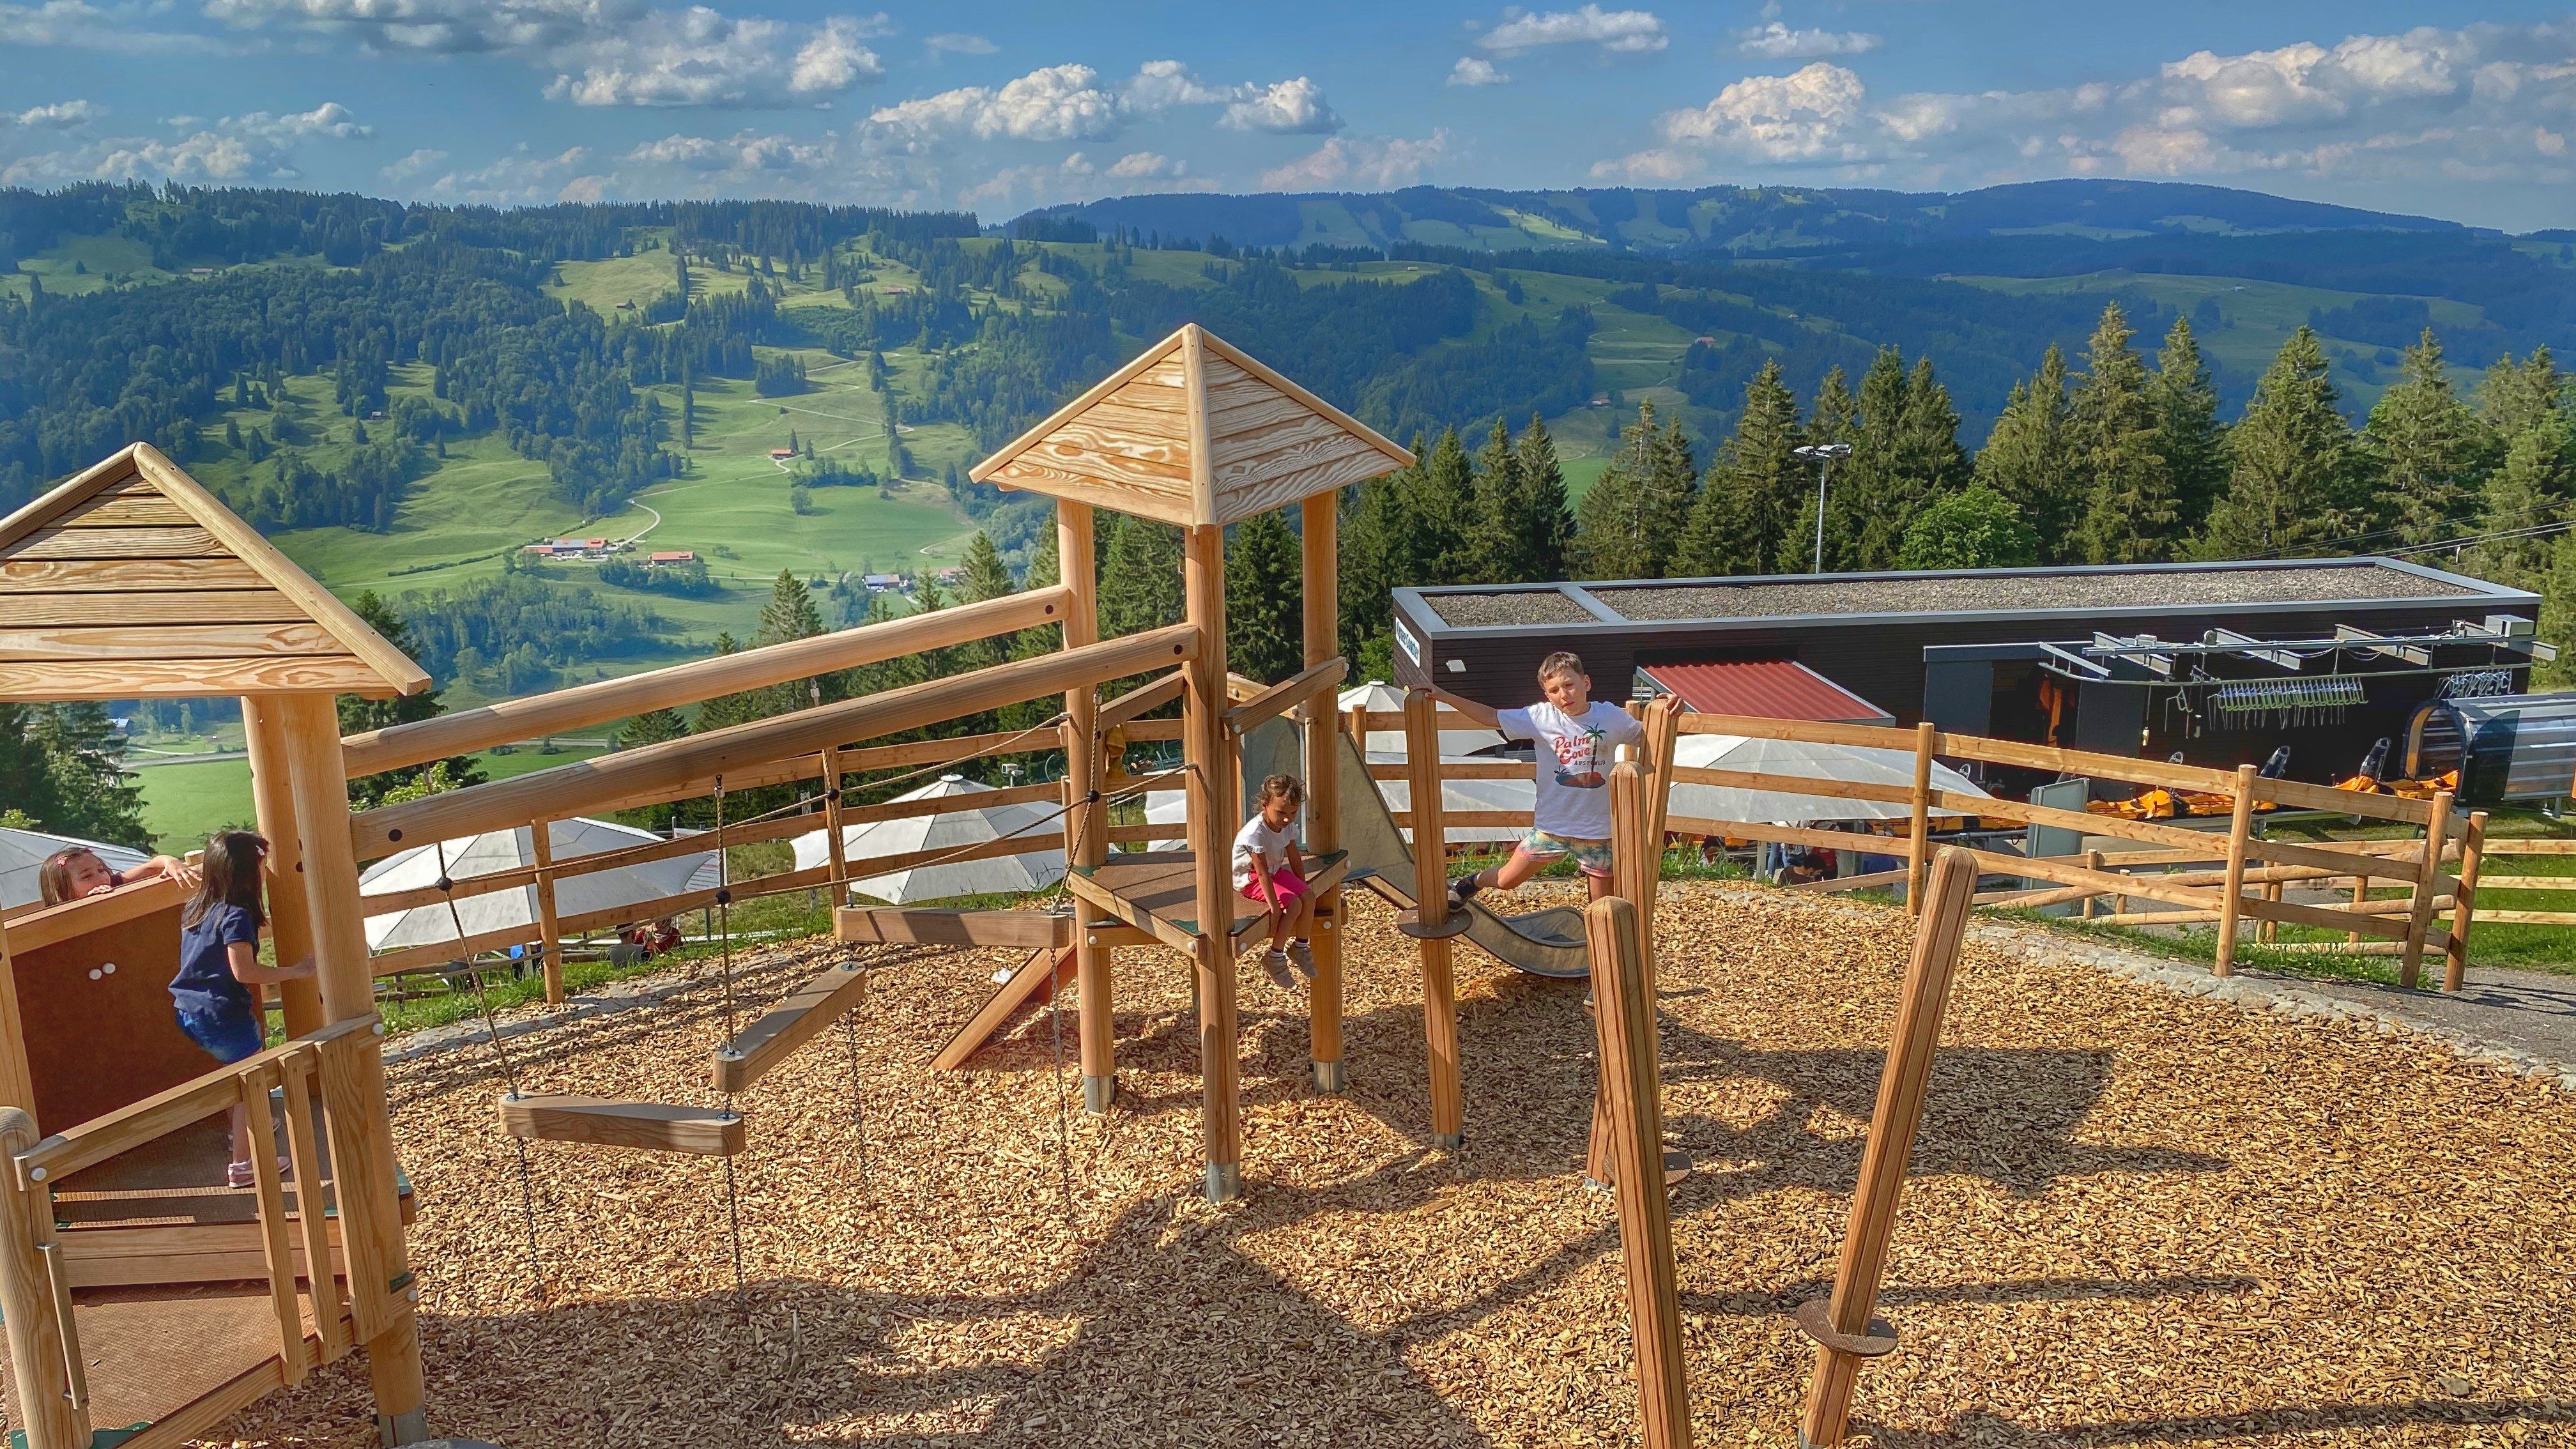 Alpsee Bergwelt Spielplatz Coaster